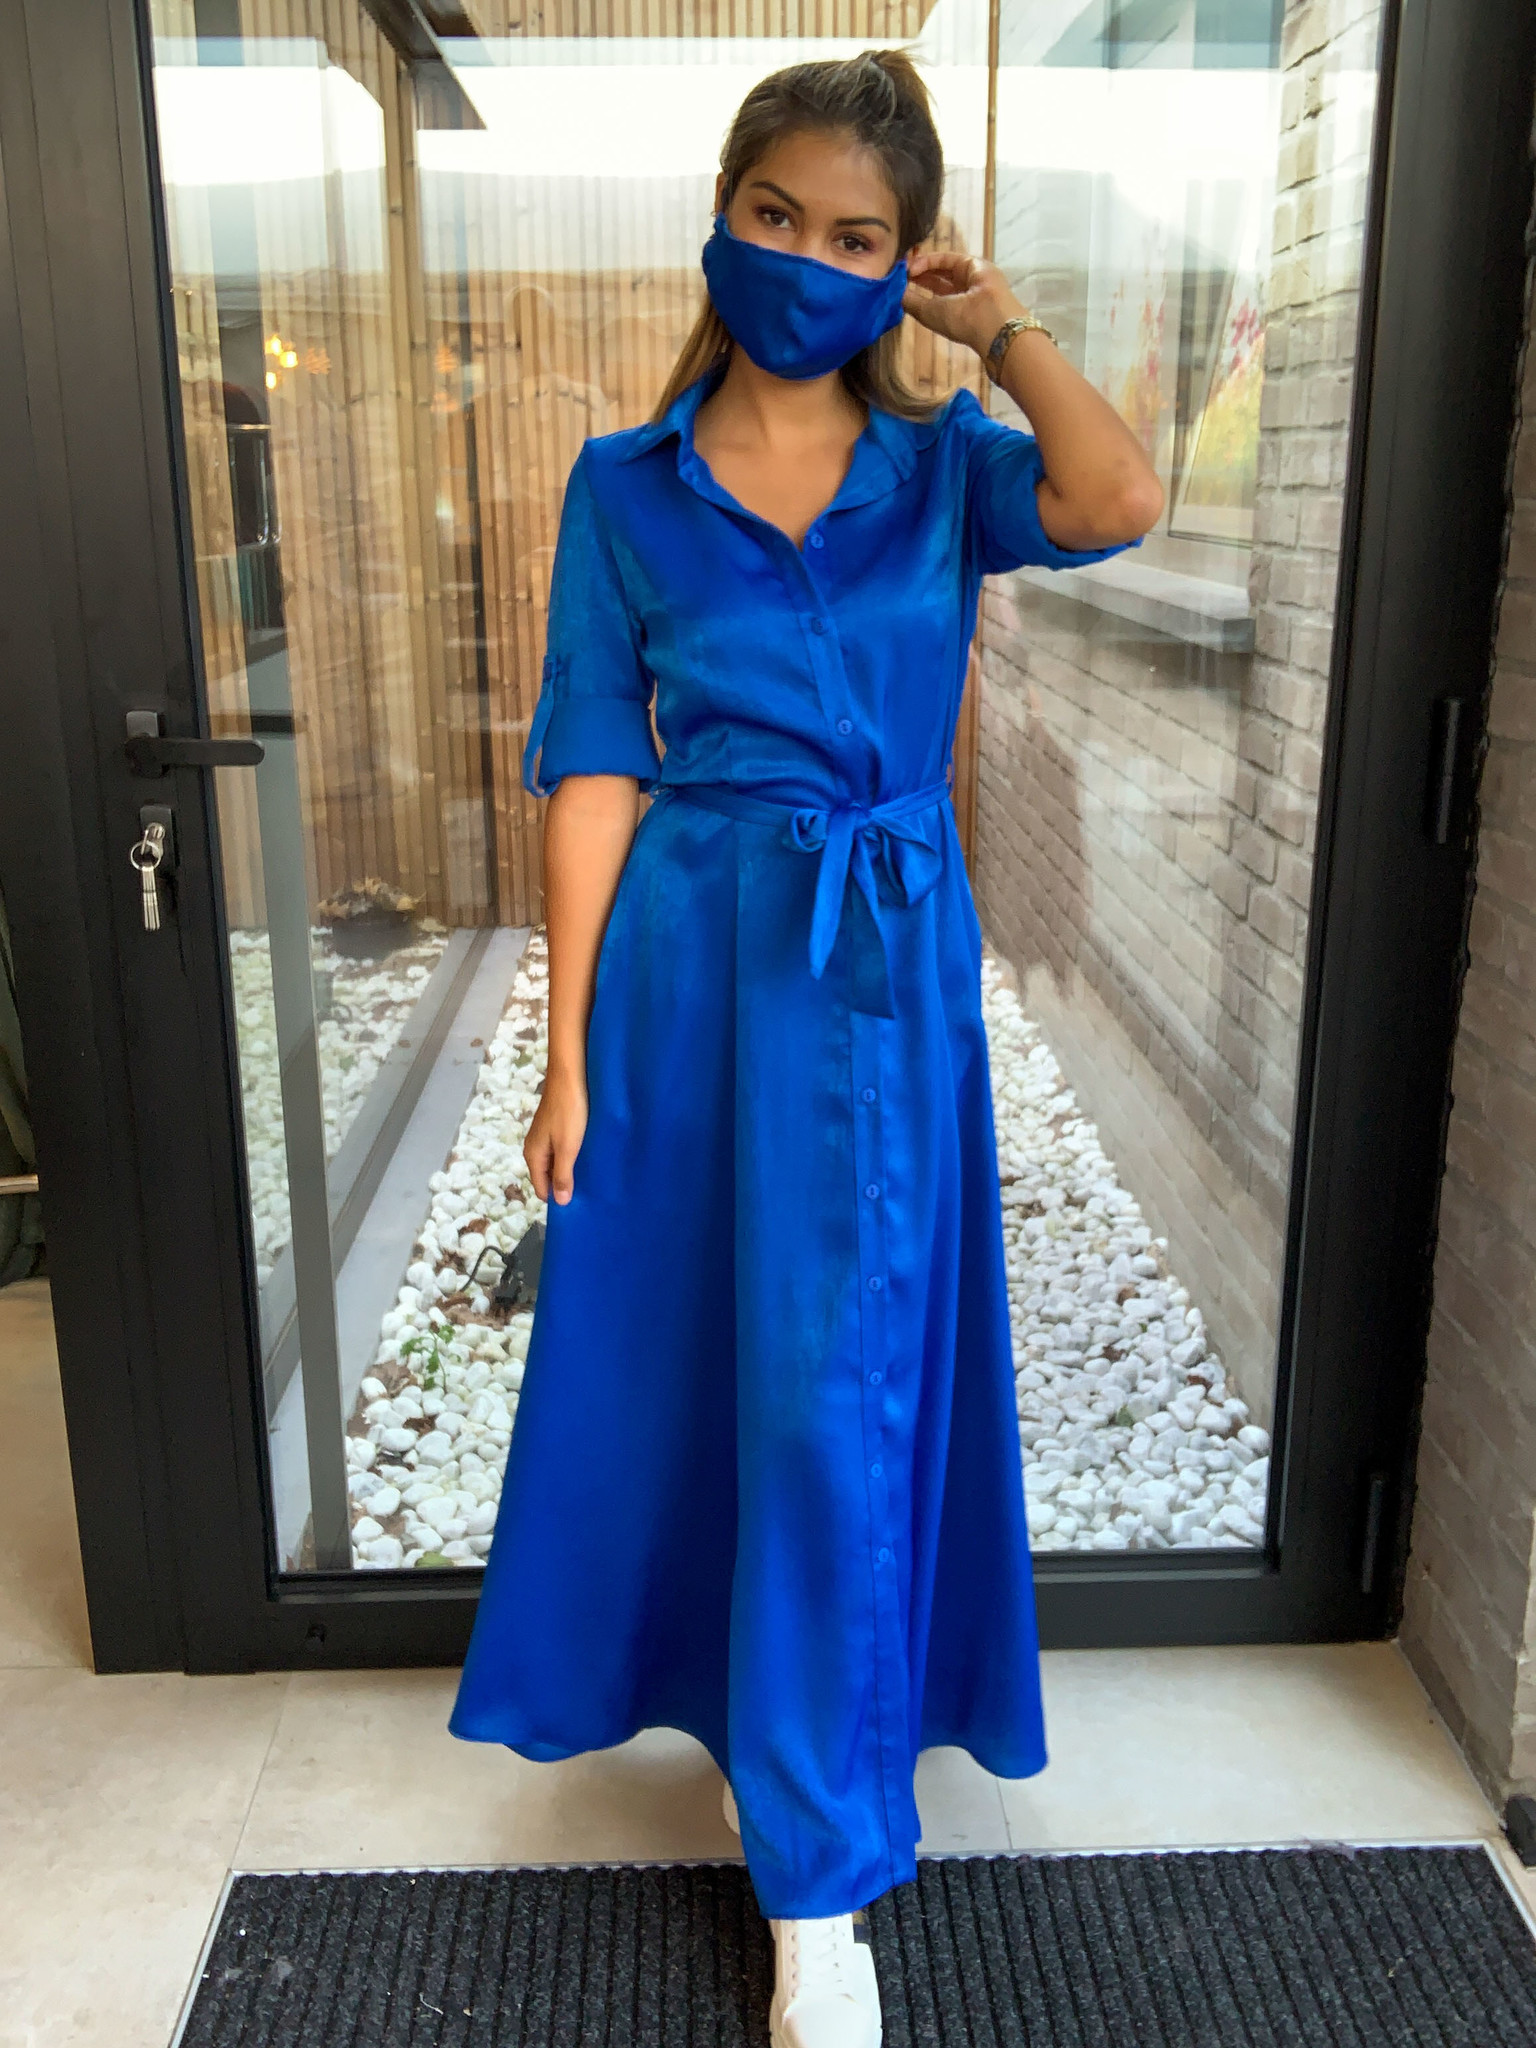 Beau et Lou Dress Esmee bleu